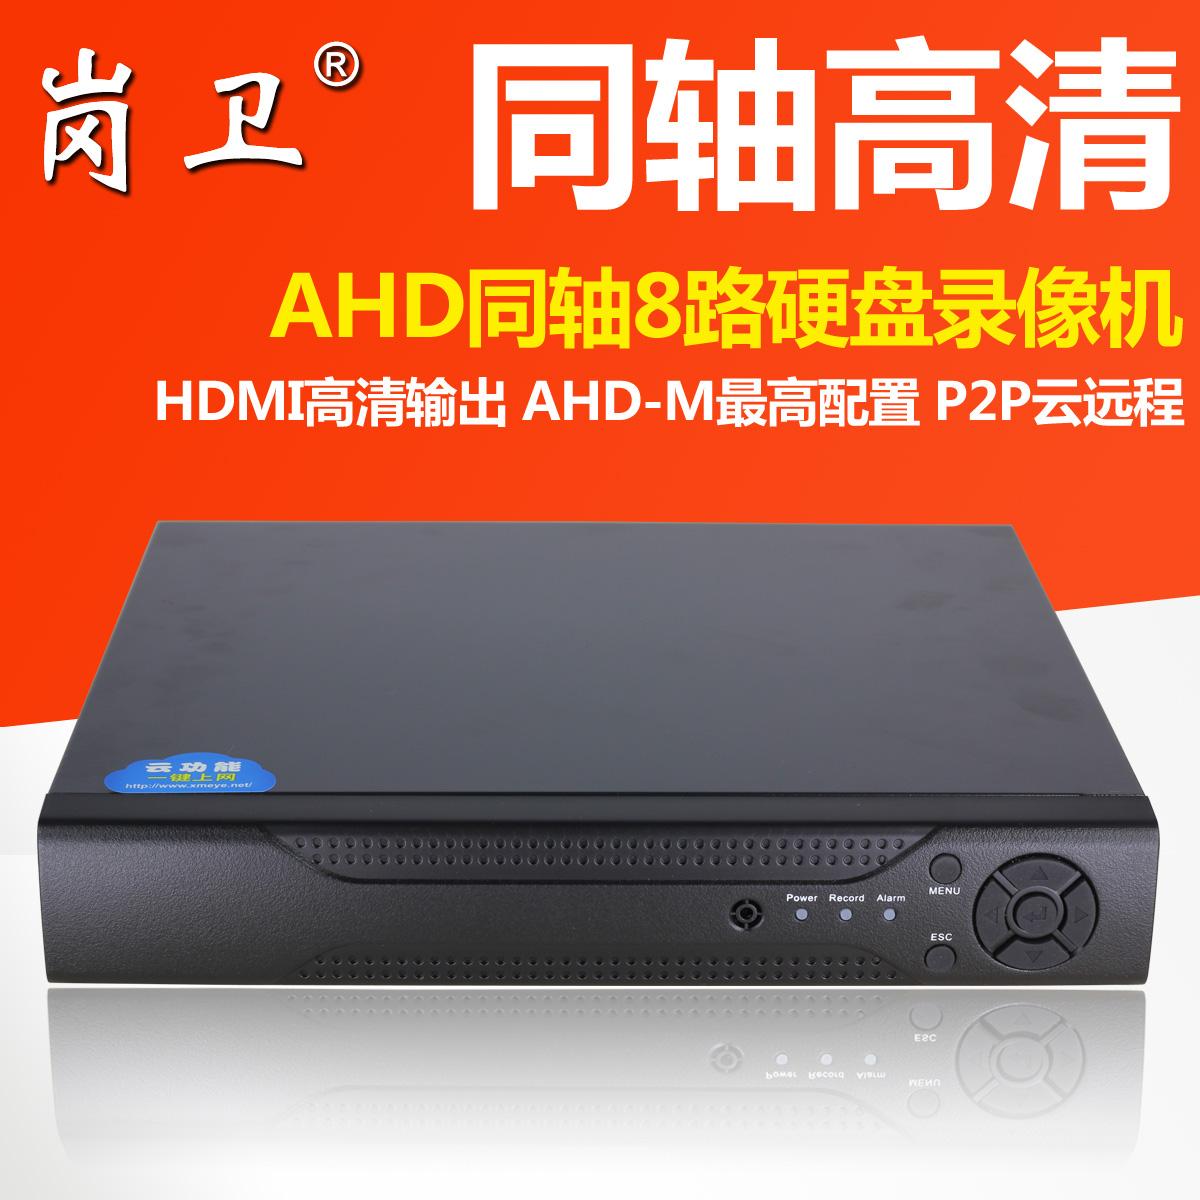 AHD同轴高清硬盘录像机8路监控主机雄迈云电脑手机远程720P最高配